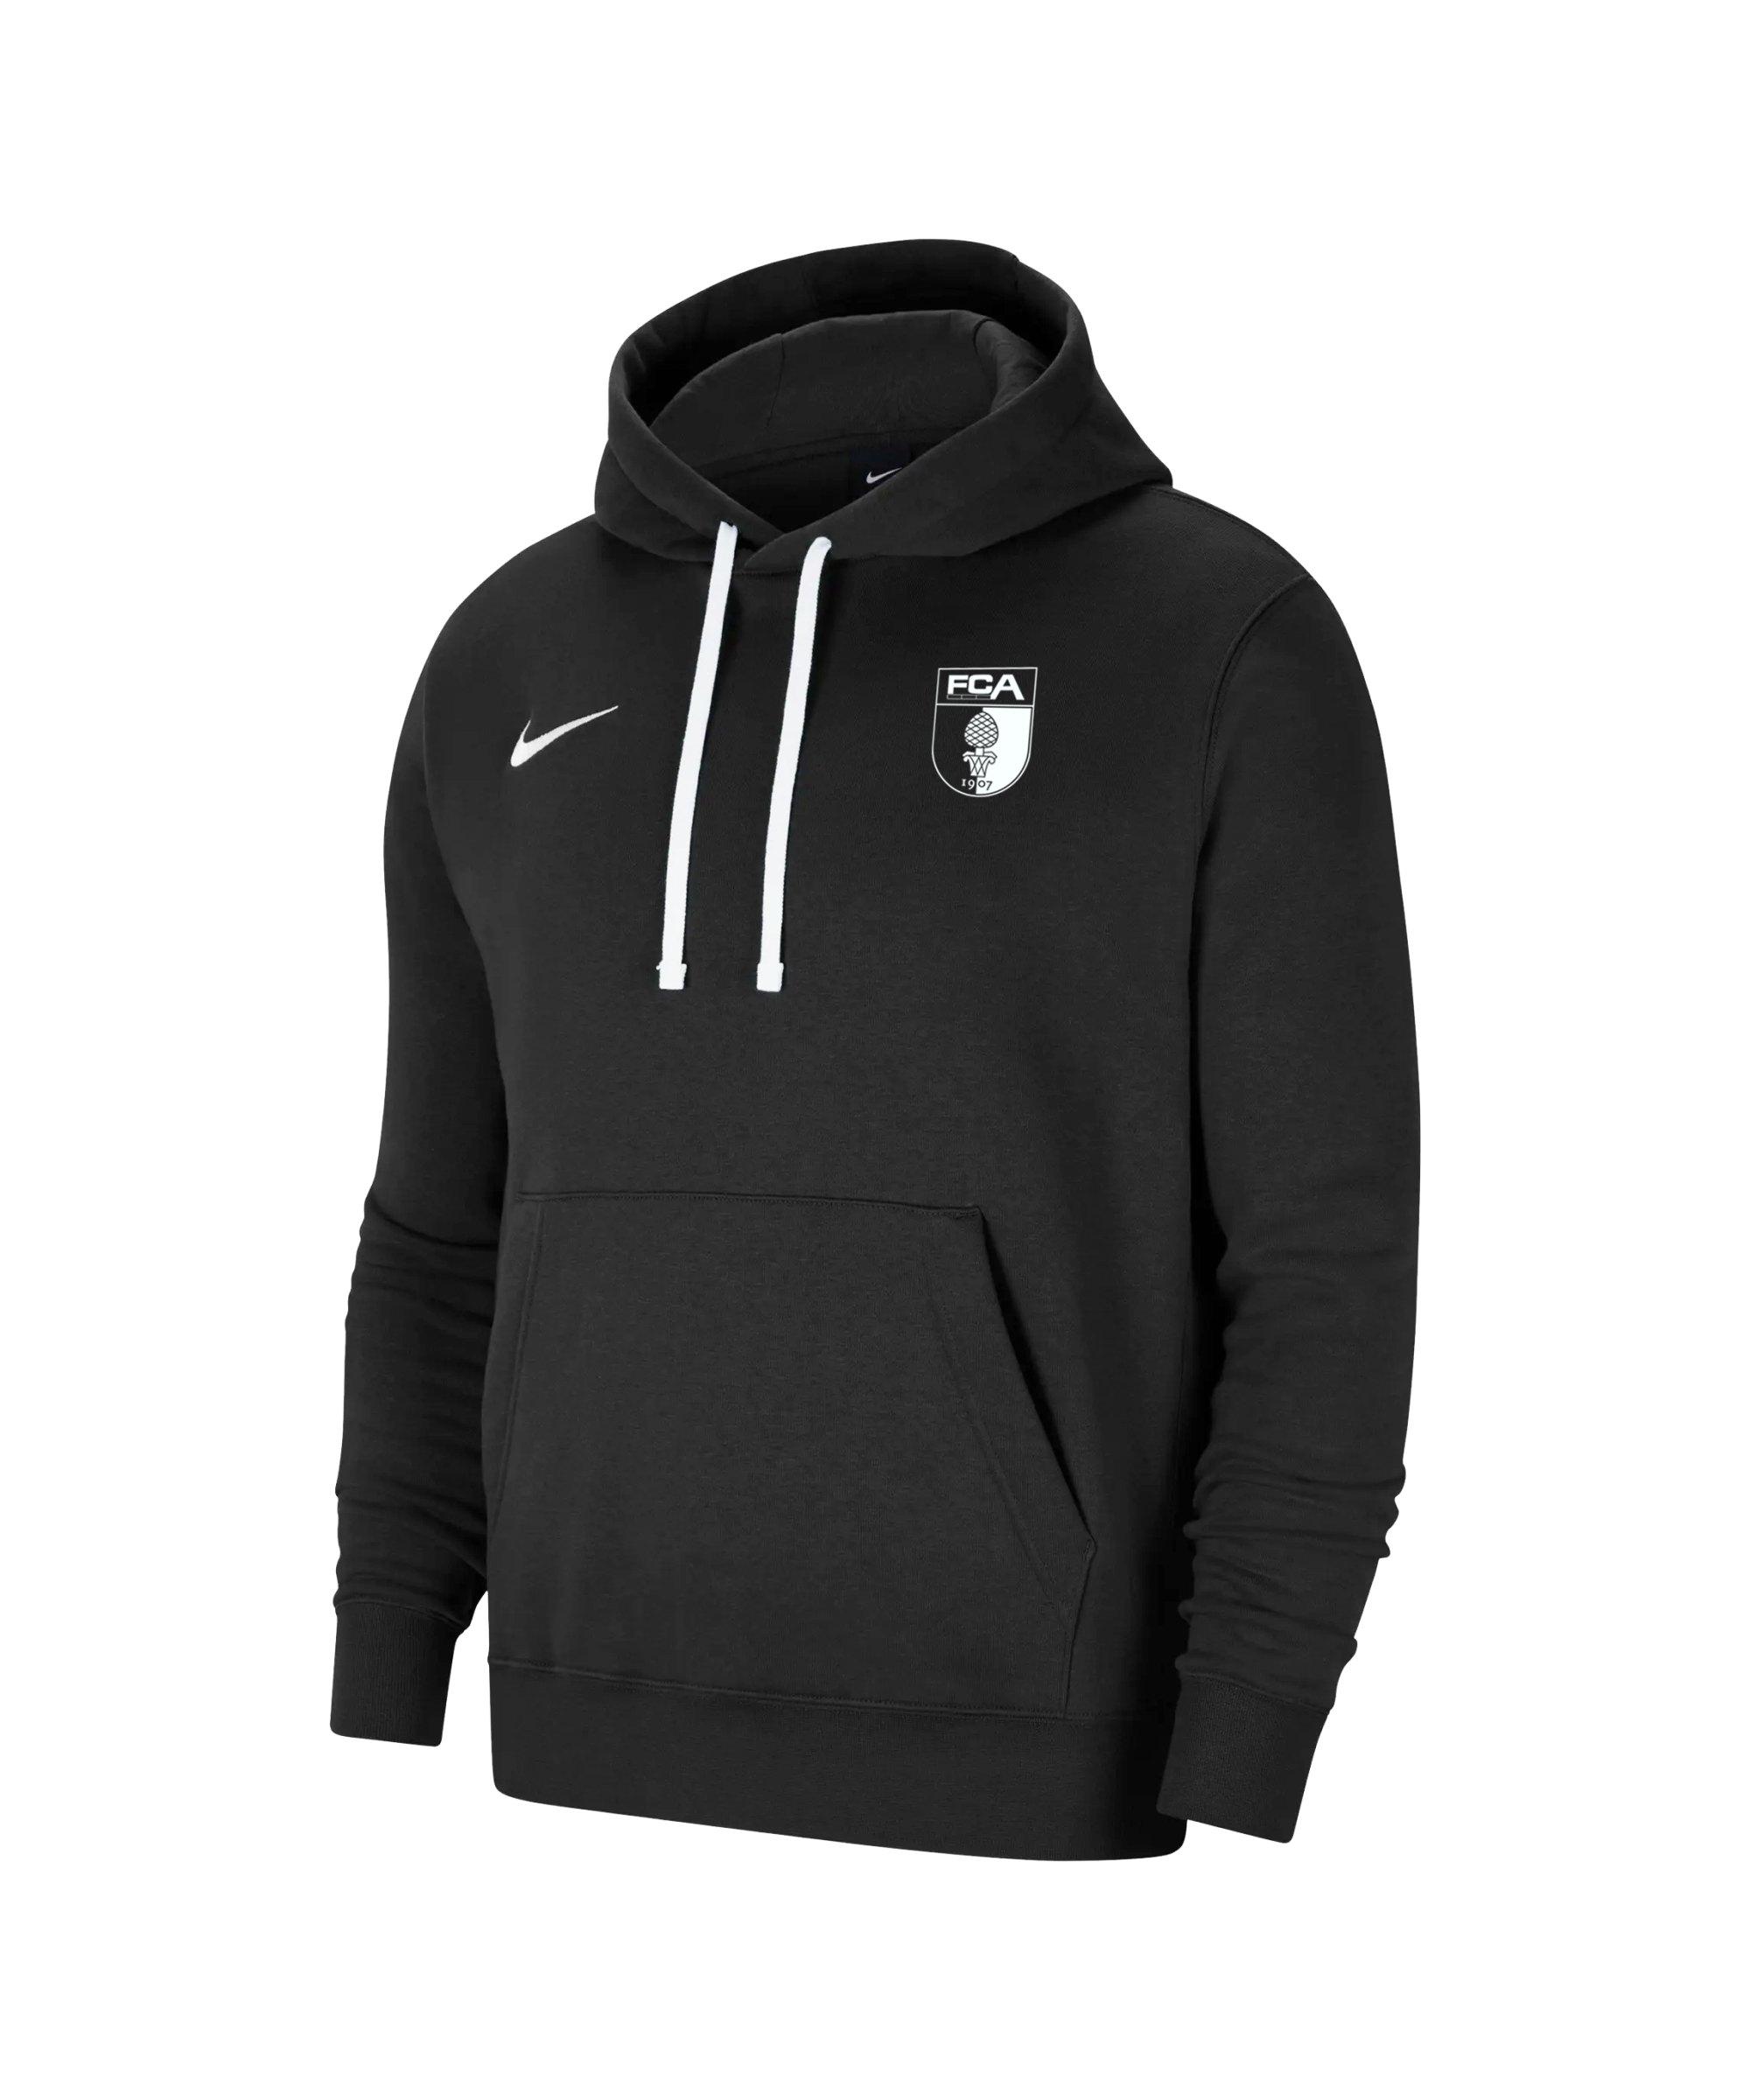 Nike FC Augsburg Fleece Hoody Schwarz F010 - schwarz